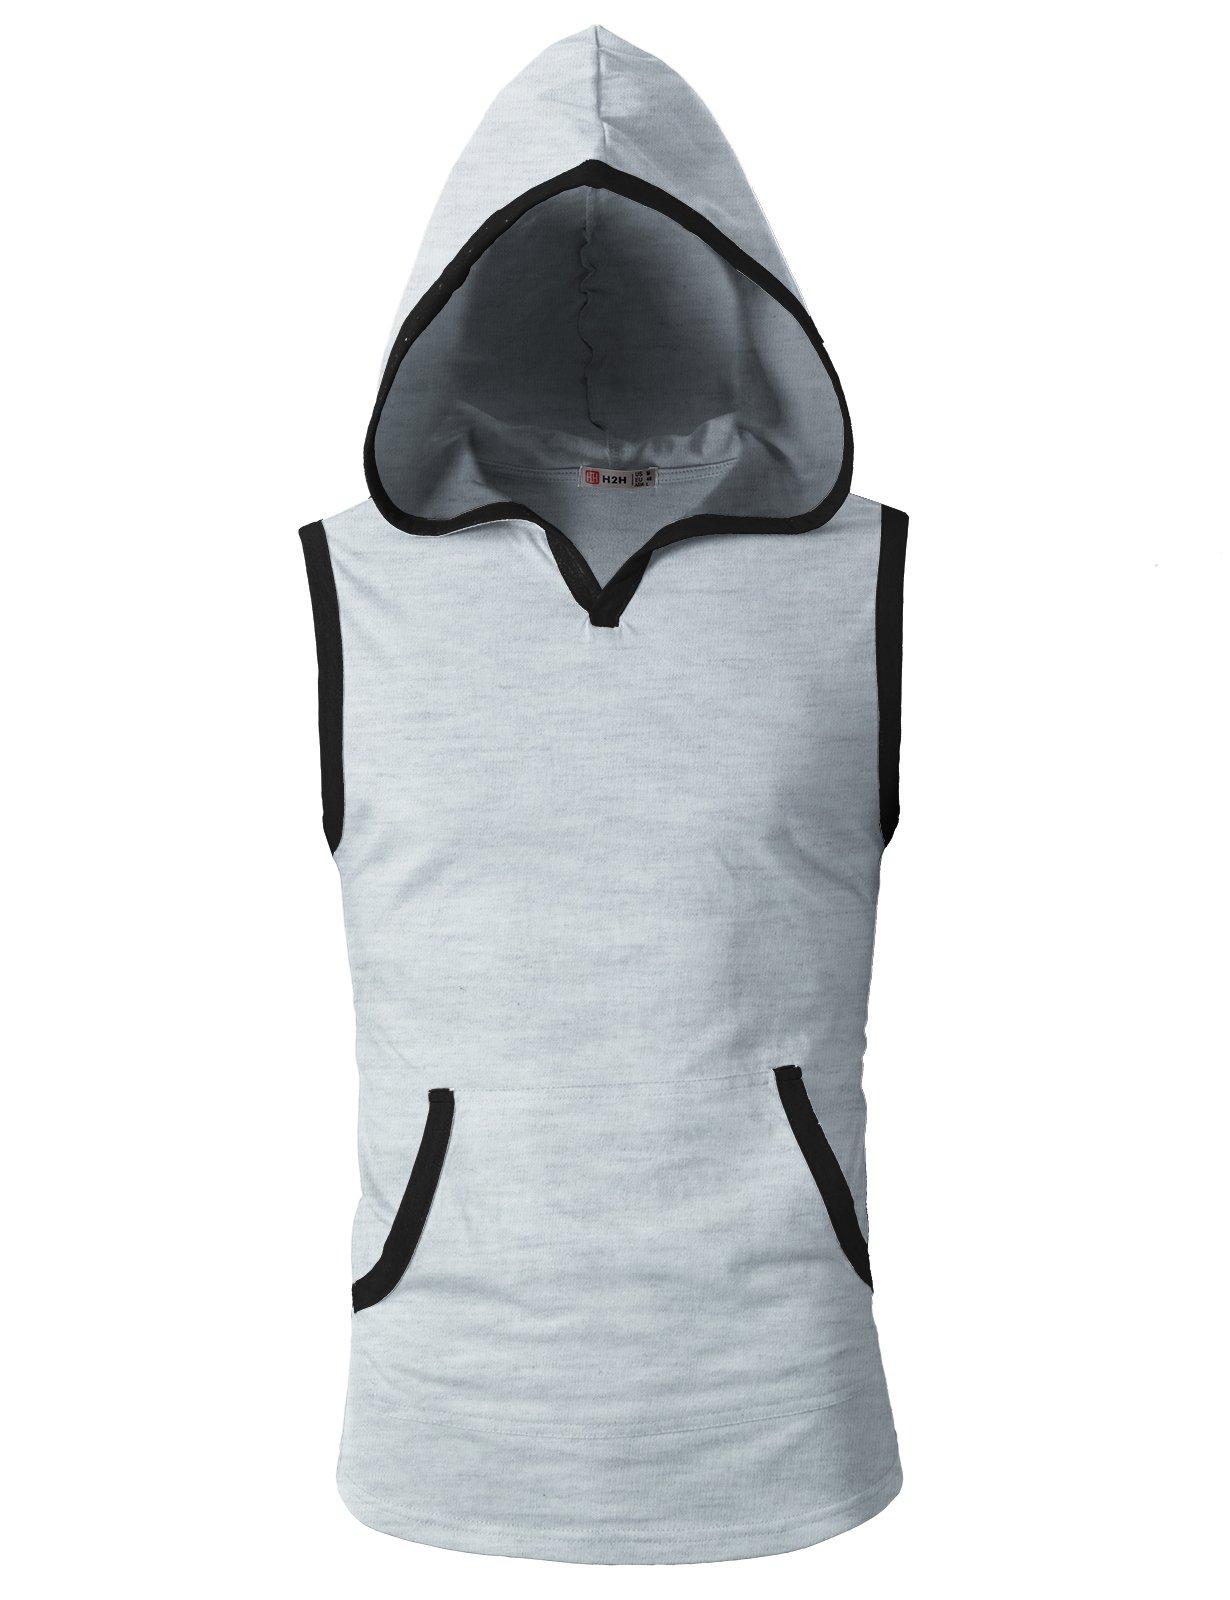 H2H Mens Sleeveless Hoodie T-Shirt Hooded Tank Top Cotton Hoodies Tee Heatherwhite US S/Asia M (CMTTK015)